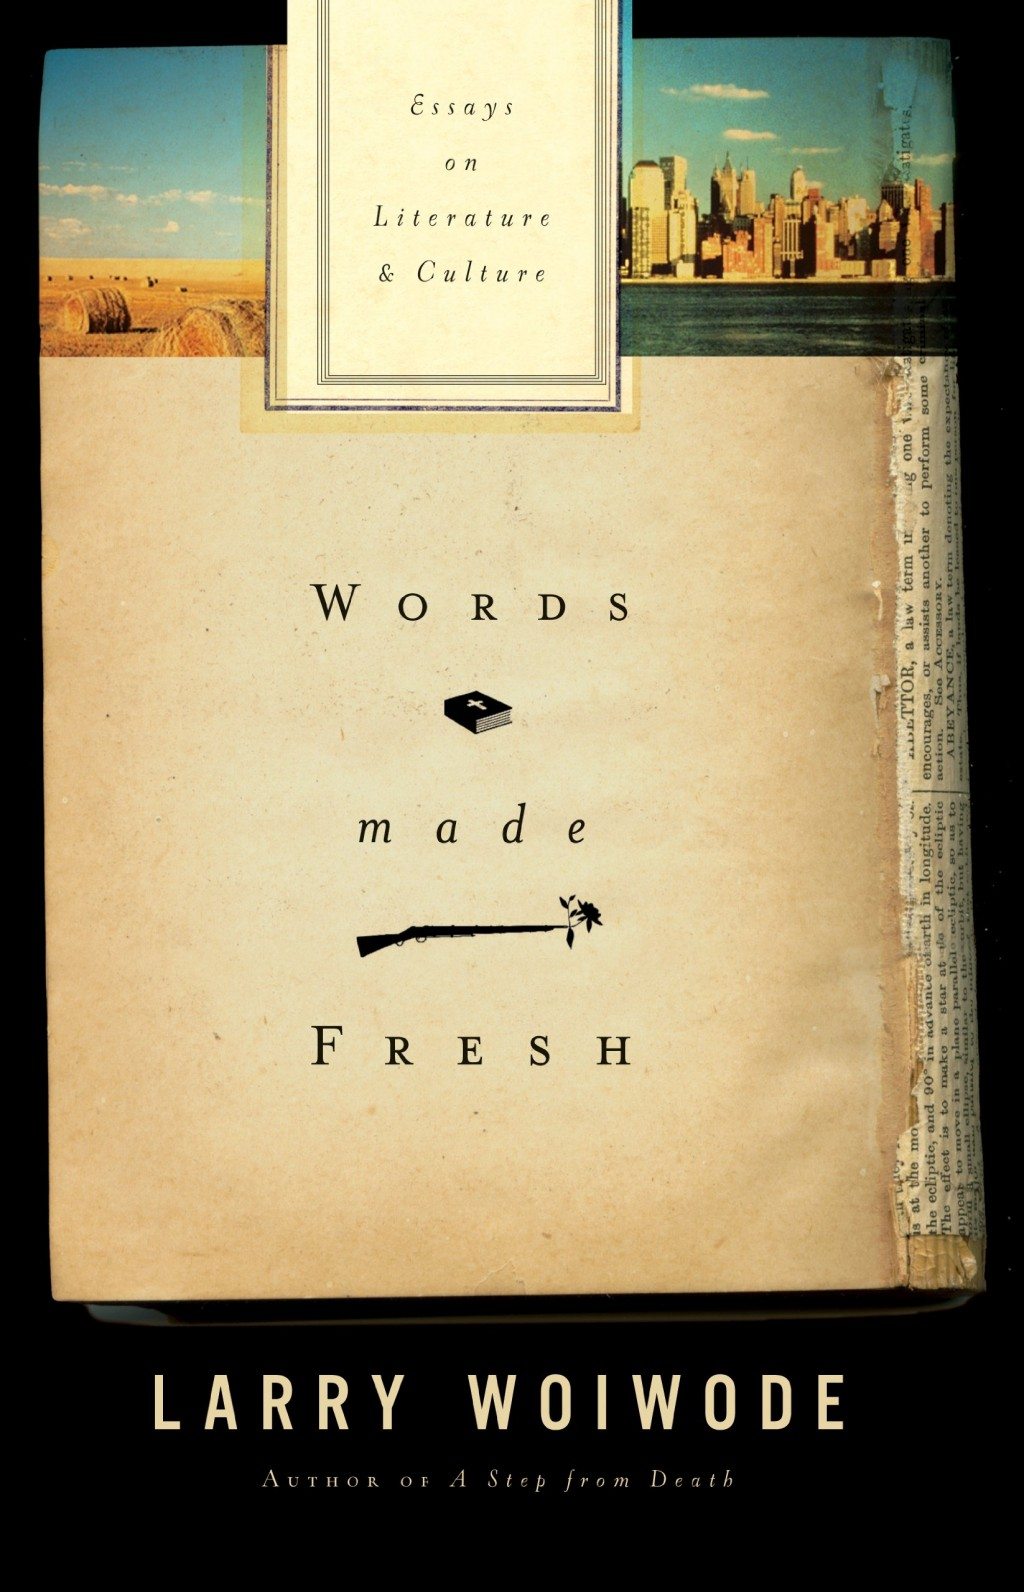 007 812bum Ji26l Fresh Essays Essay Wondrous Contact Uk Large